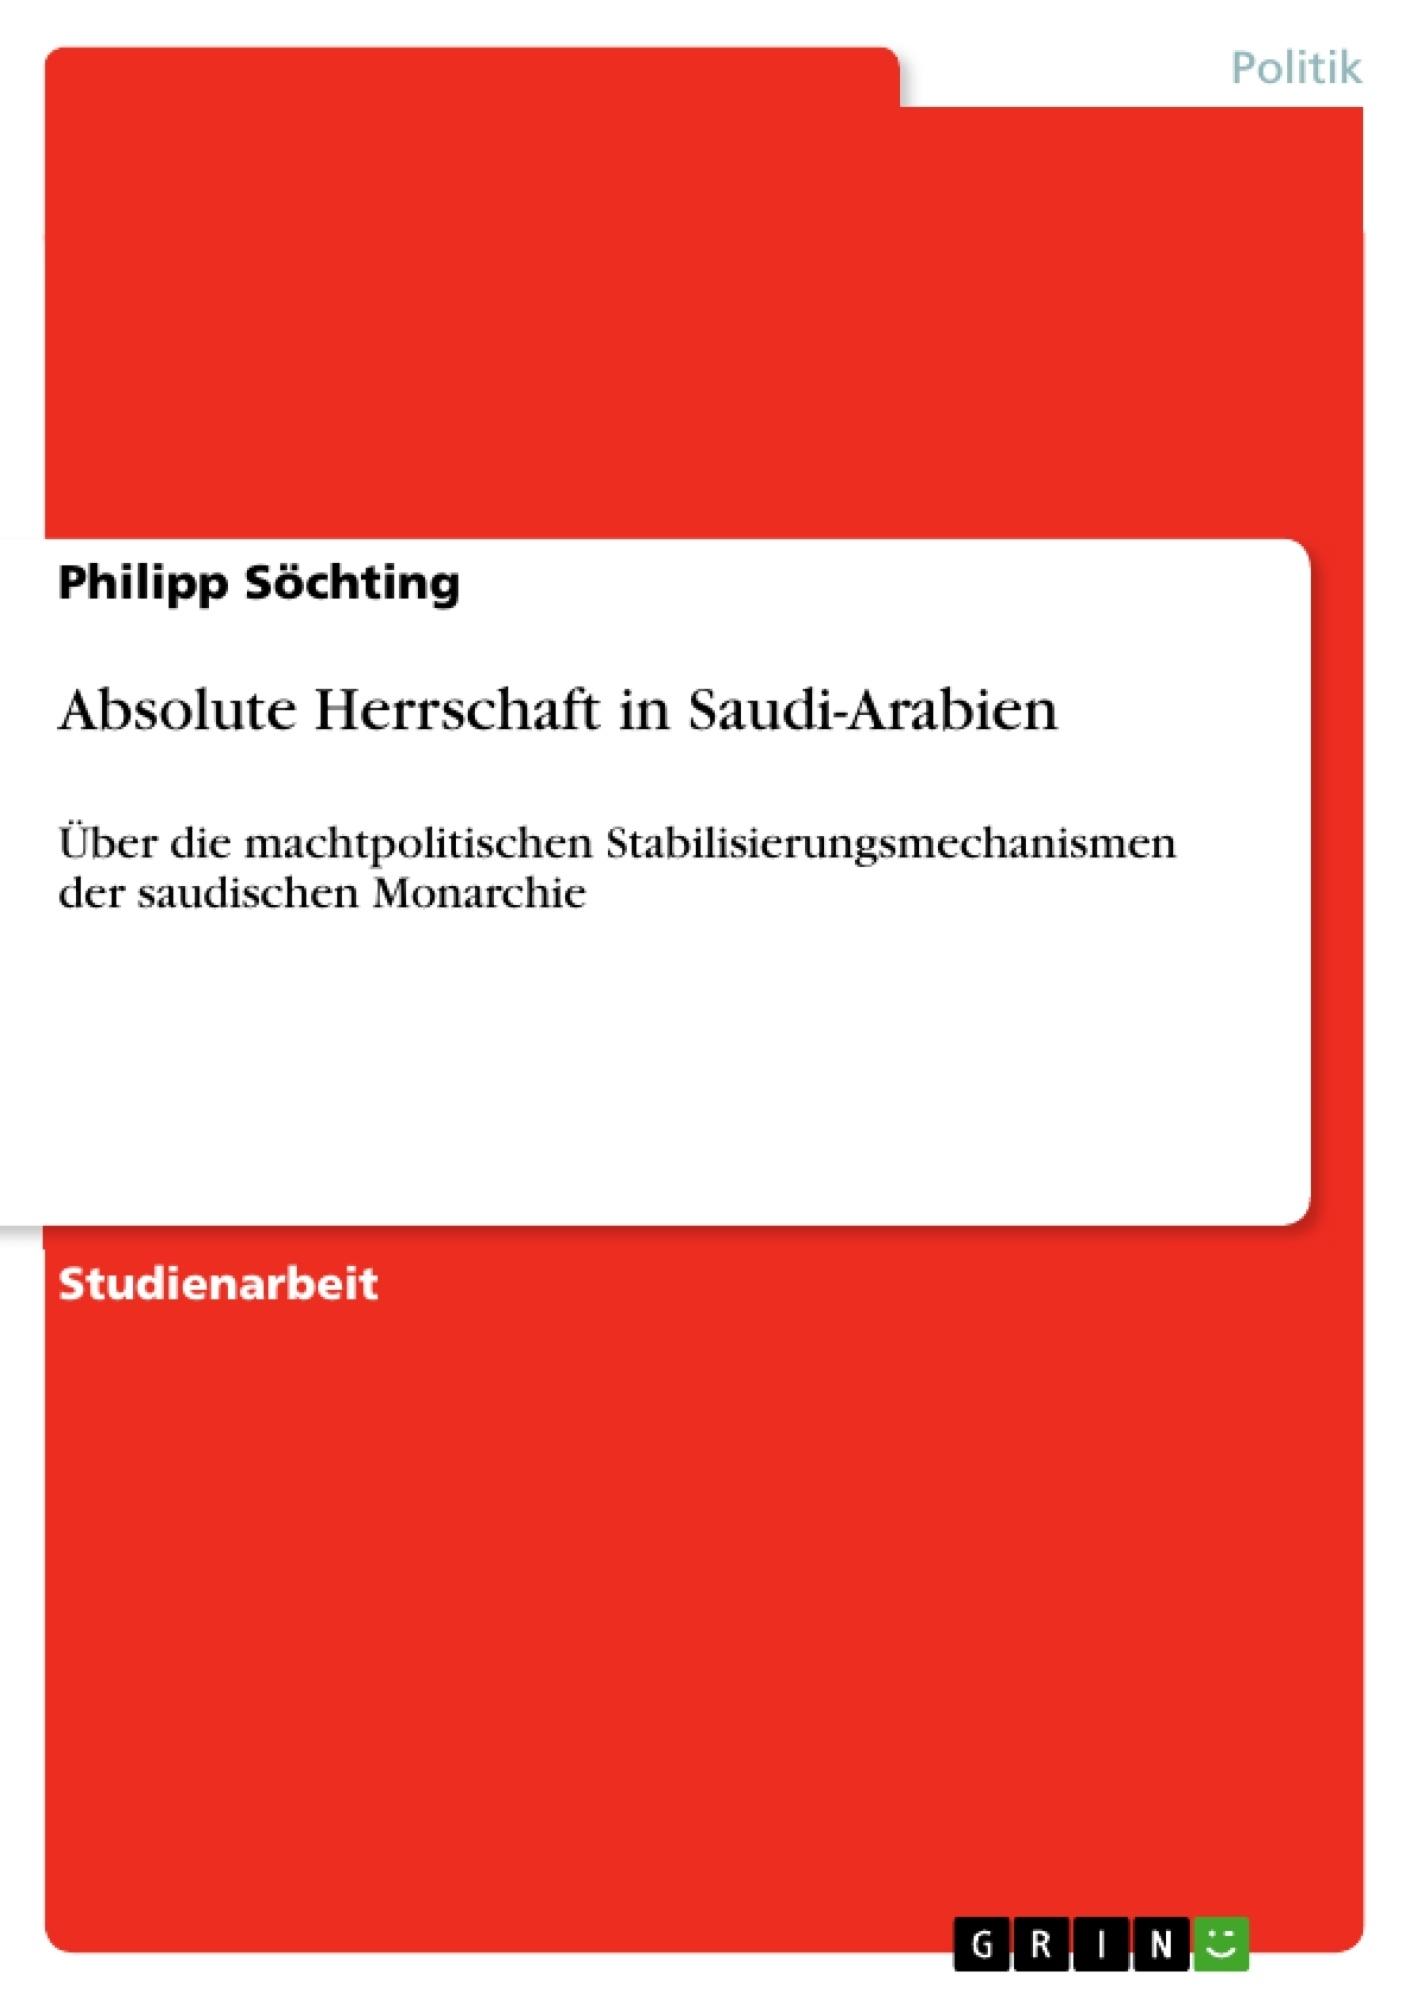 Titel: Absolute Herrschaft in Saudi-Arabien